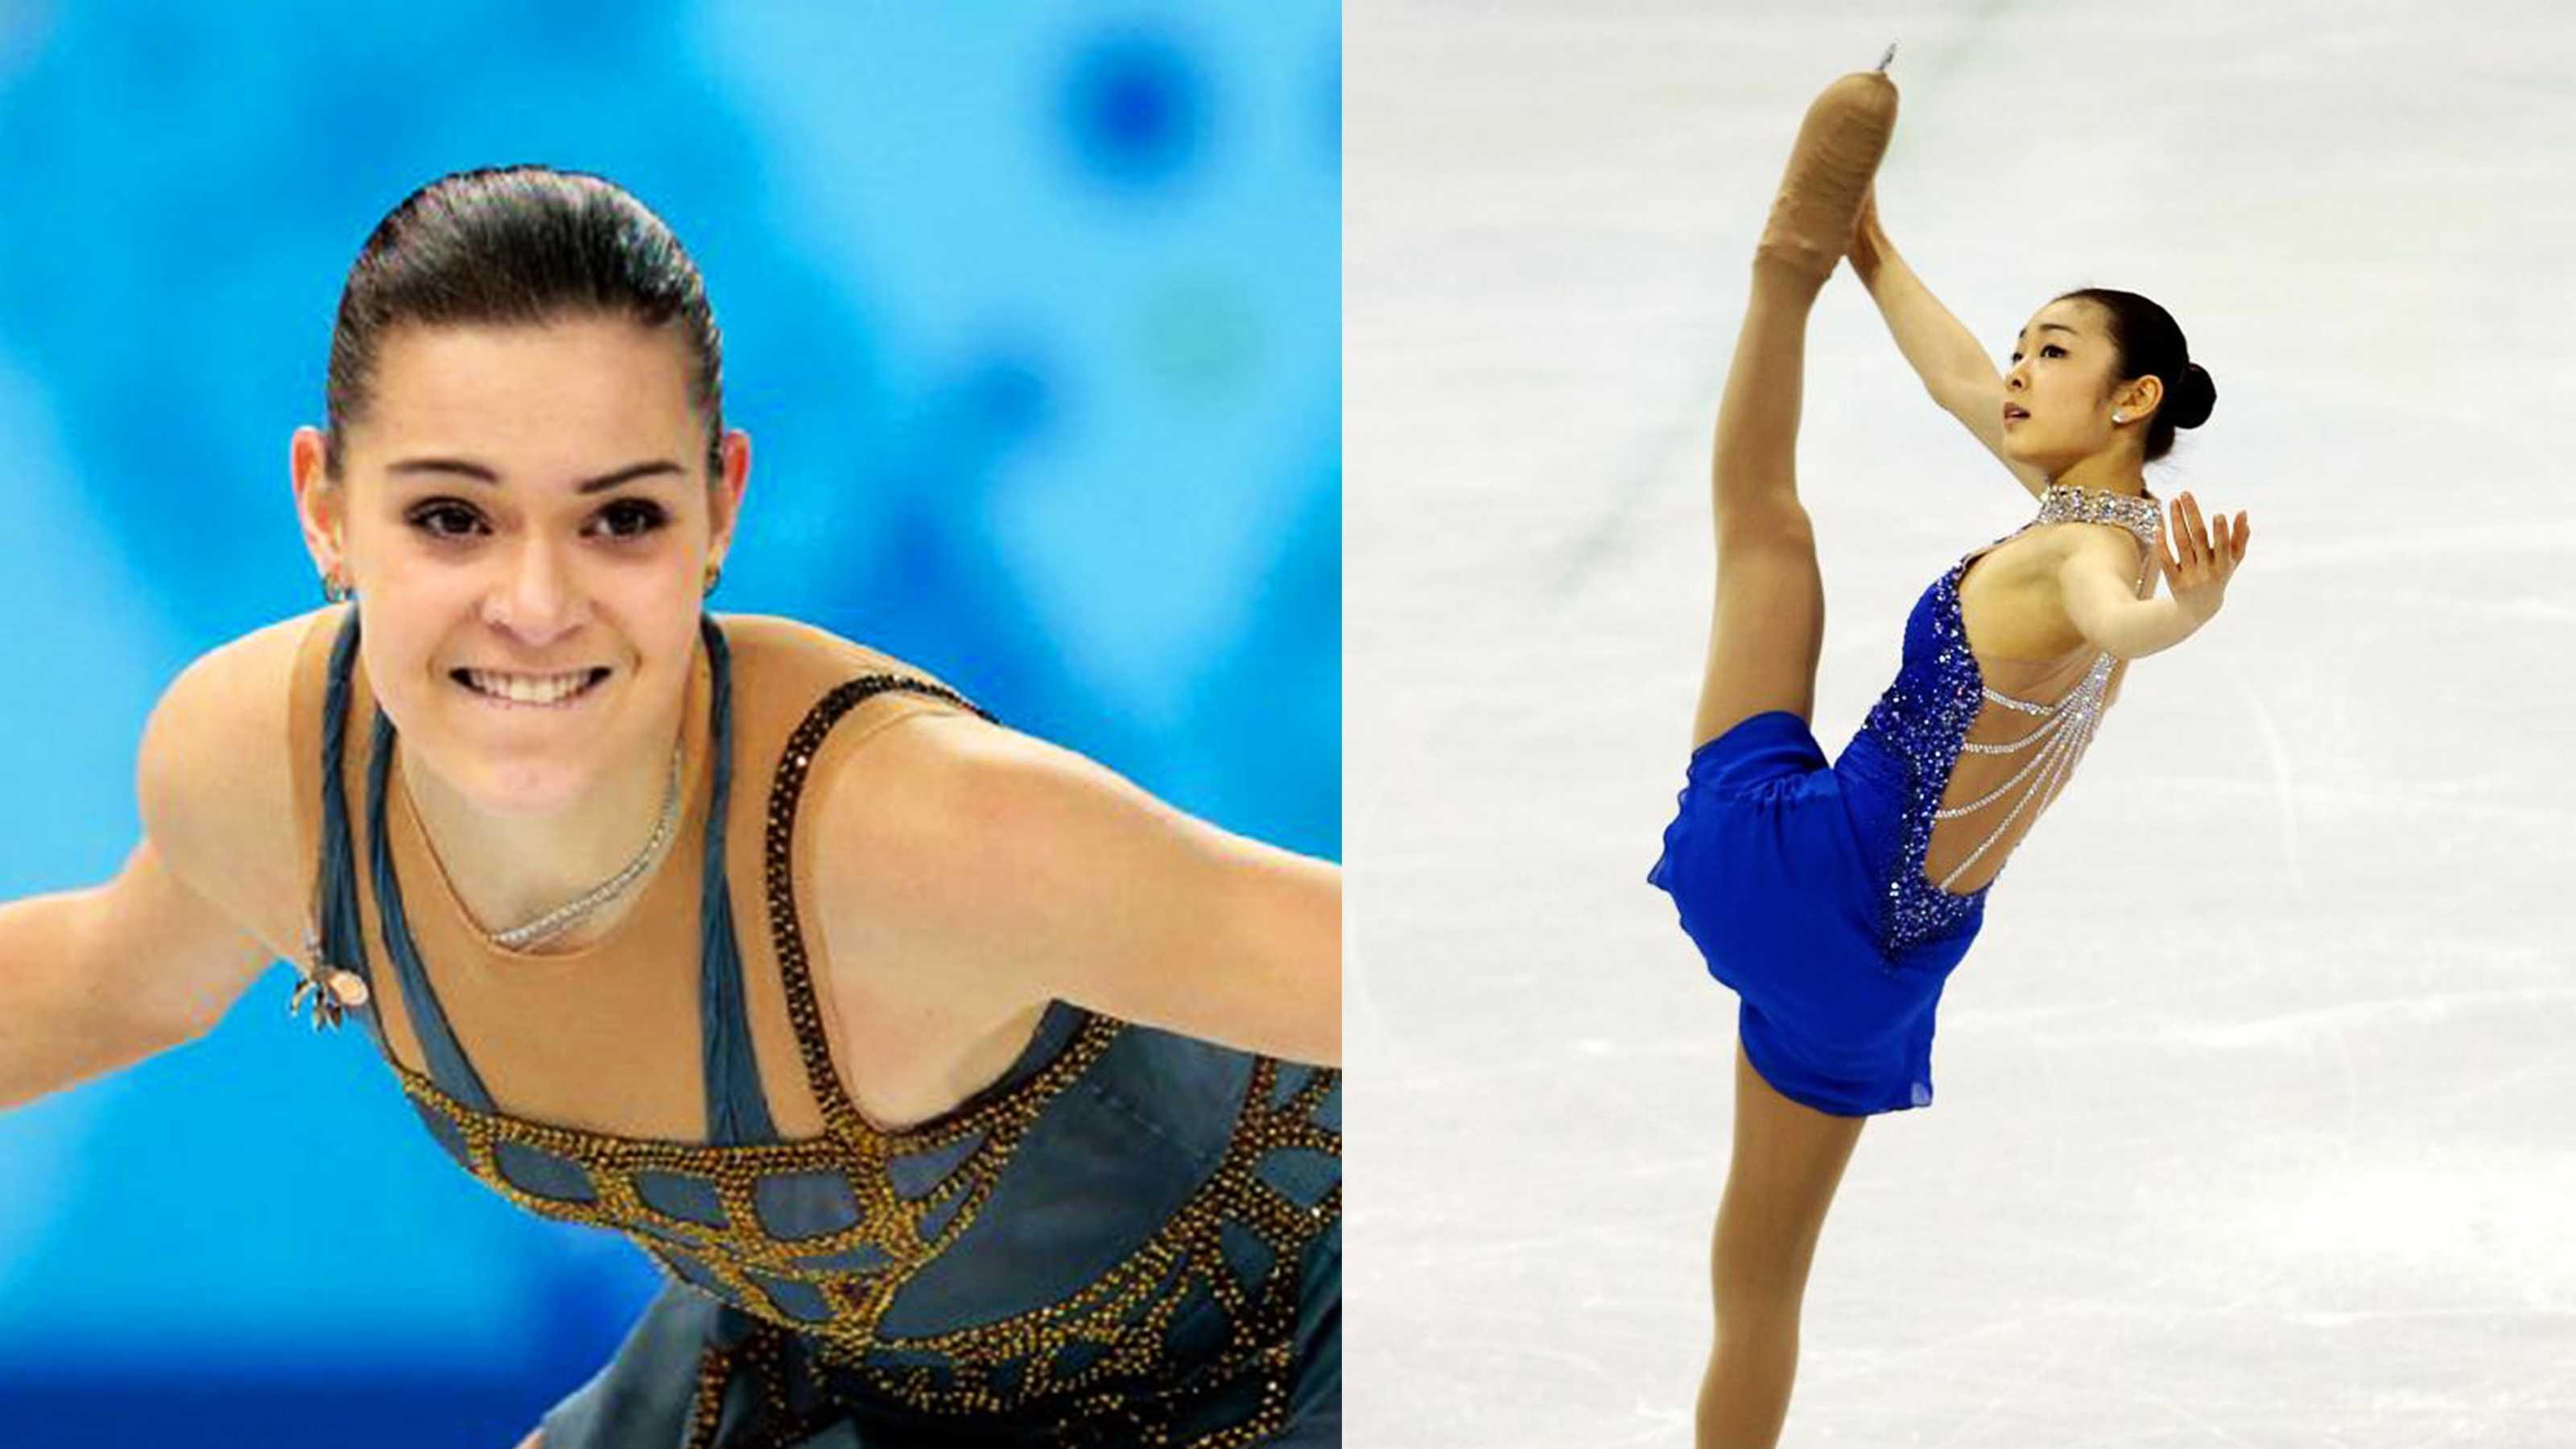 Russian Adelina Sotnikova, left, and South Korean Yuna Kim